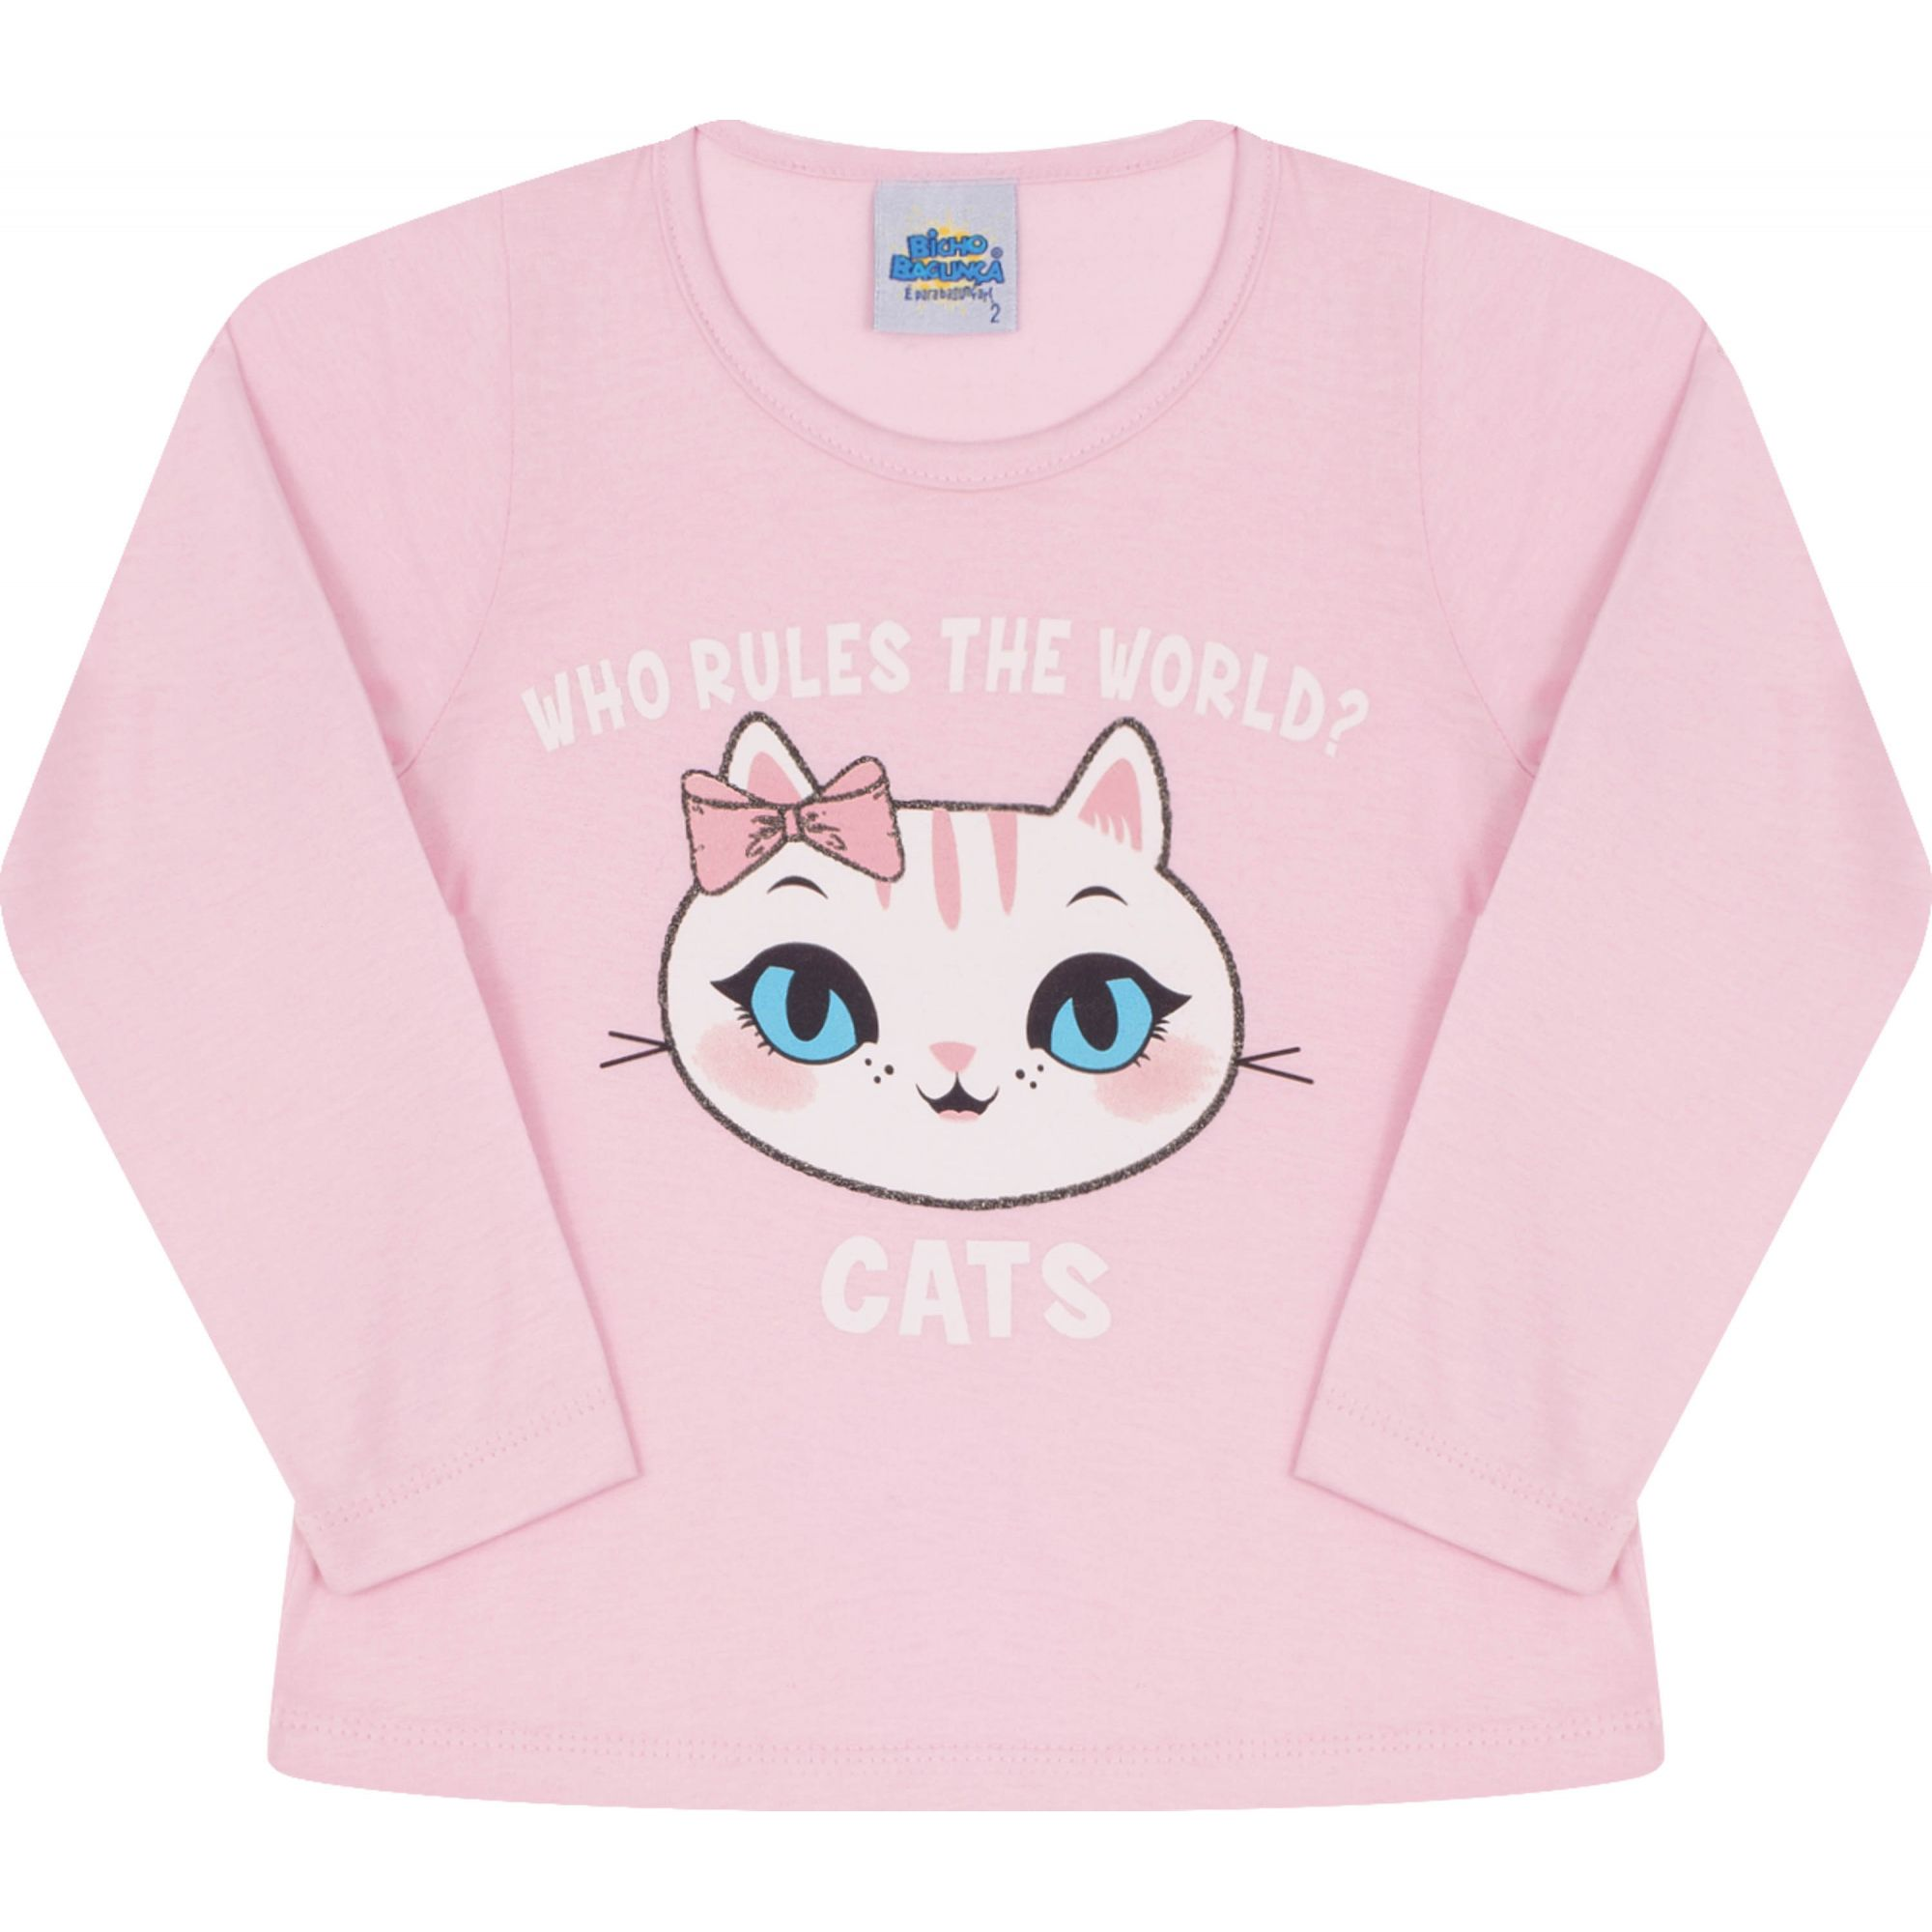 Camiseta Cats Rosa Bicho Bagunça